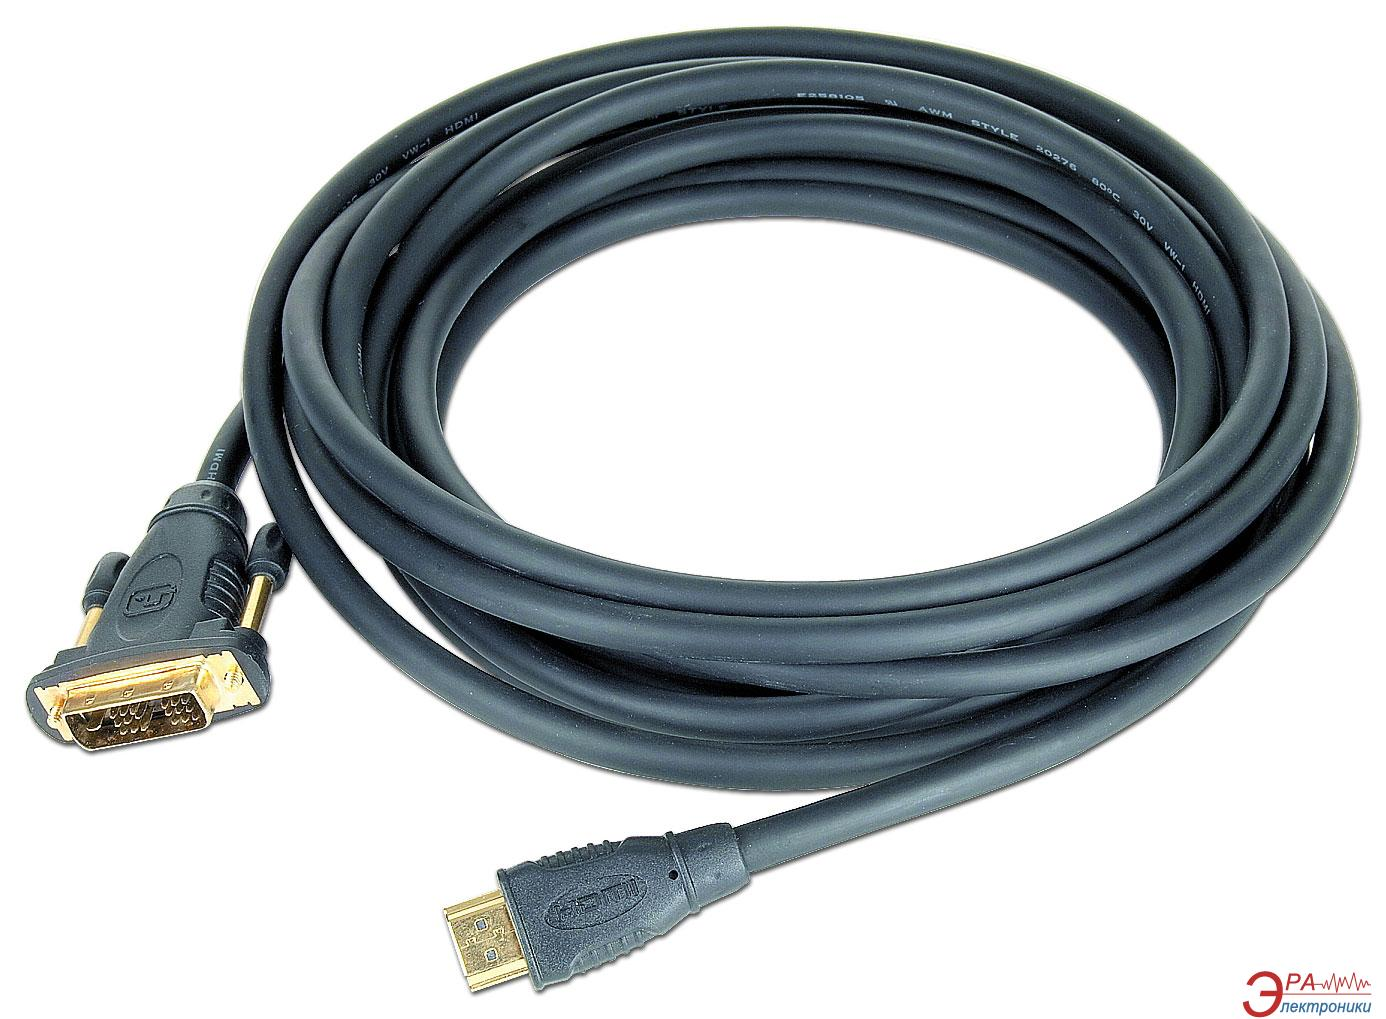 Кабель Gembird HDMI to DVI 18+1pin M 10.0m (CC-HDMI-DVI-10MC)